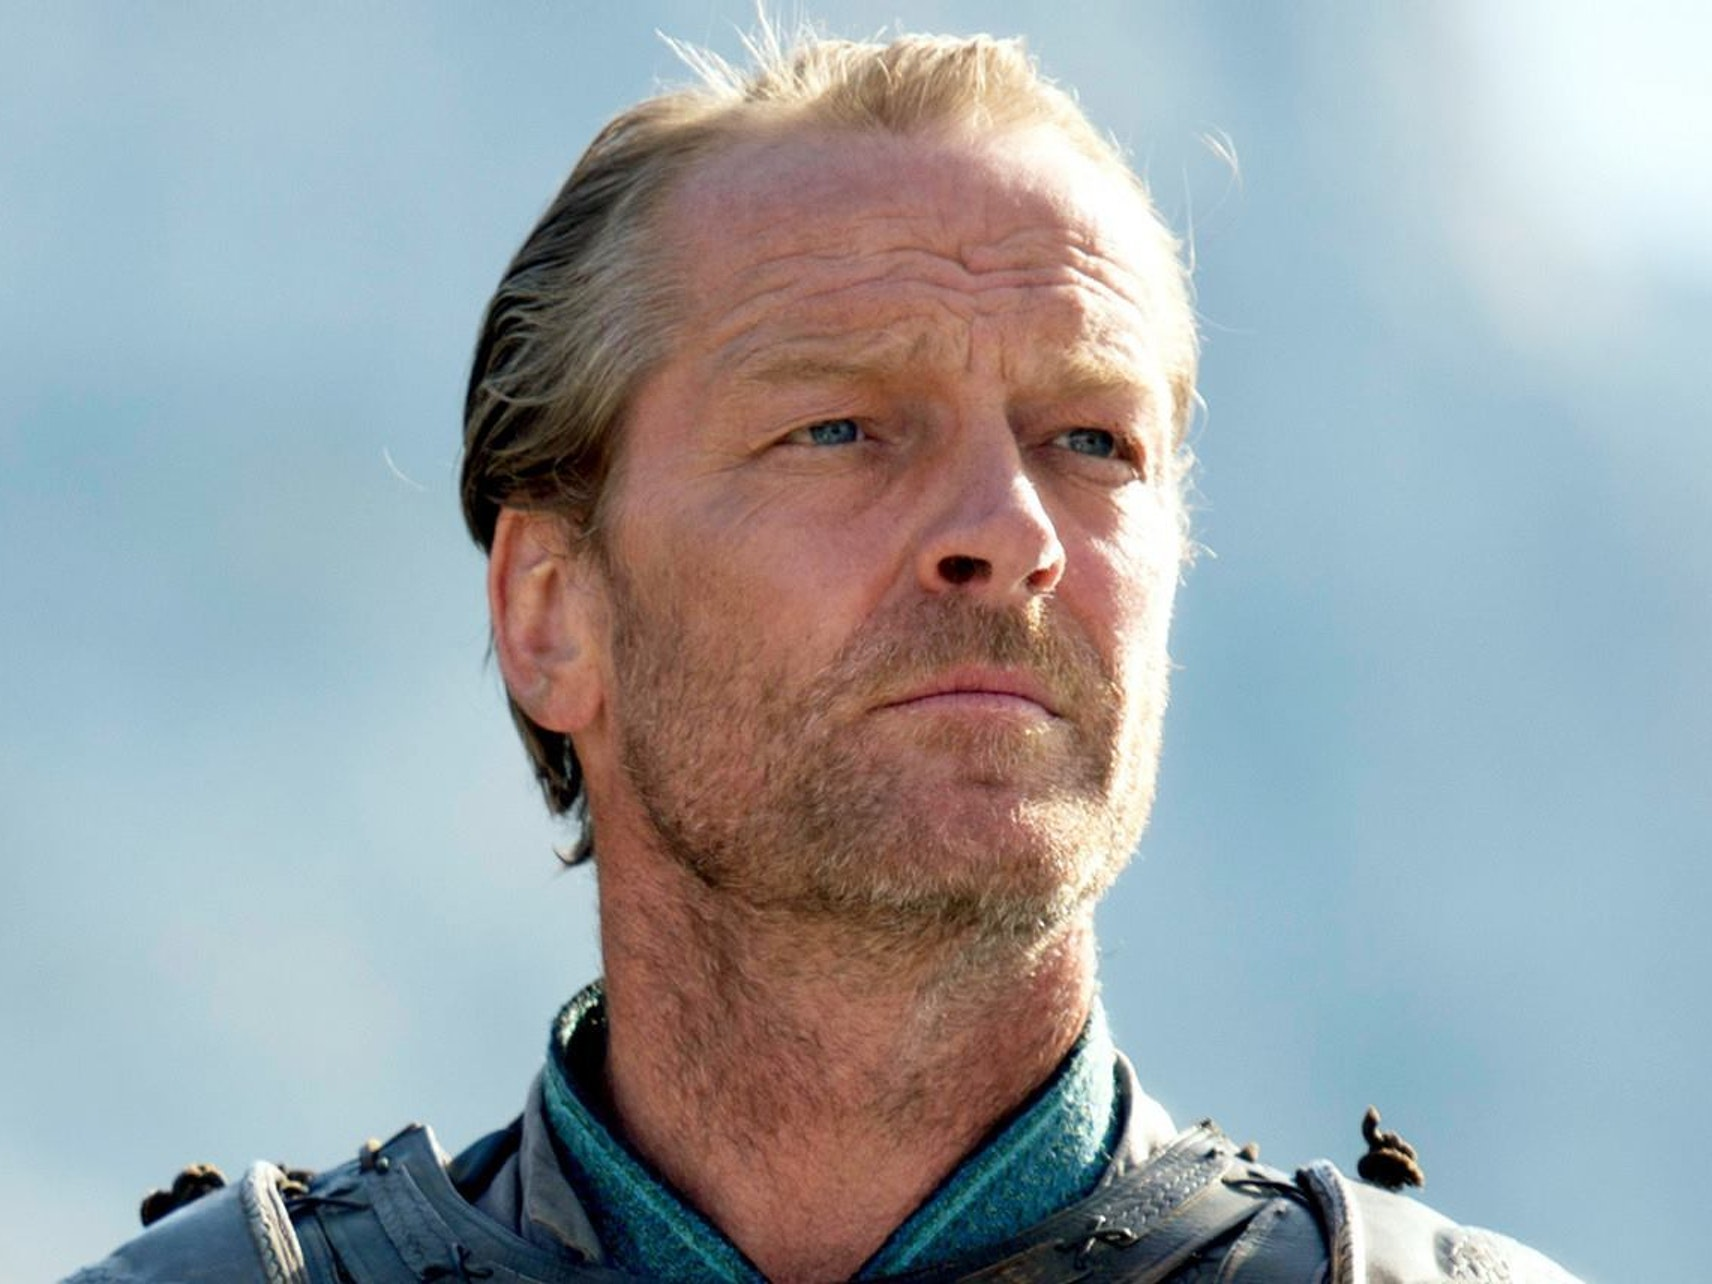 Game of Thrones, Season 6, Season 7, Jorah Mormont, Grayscale